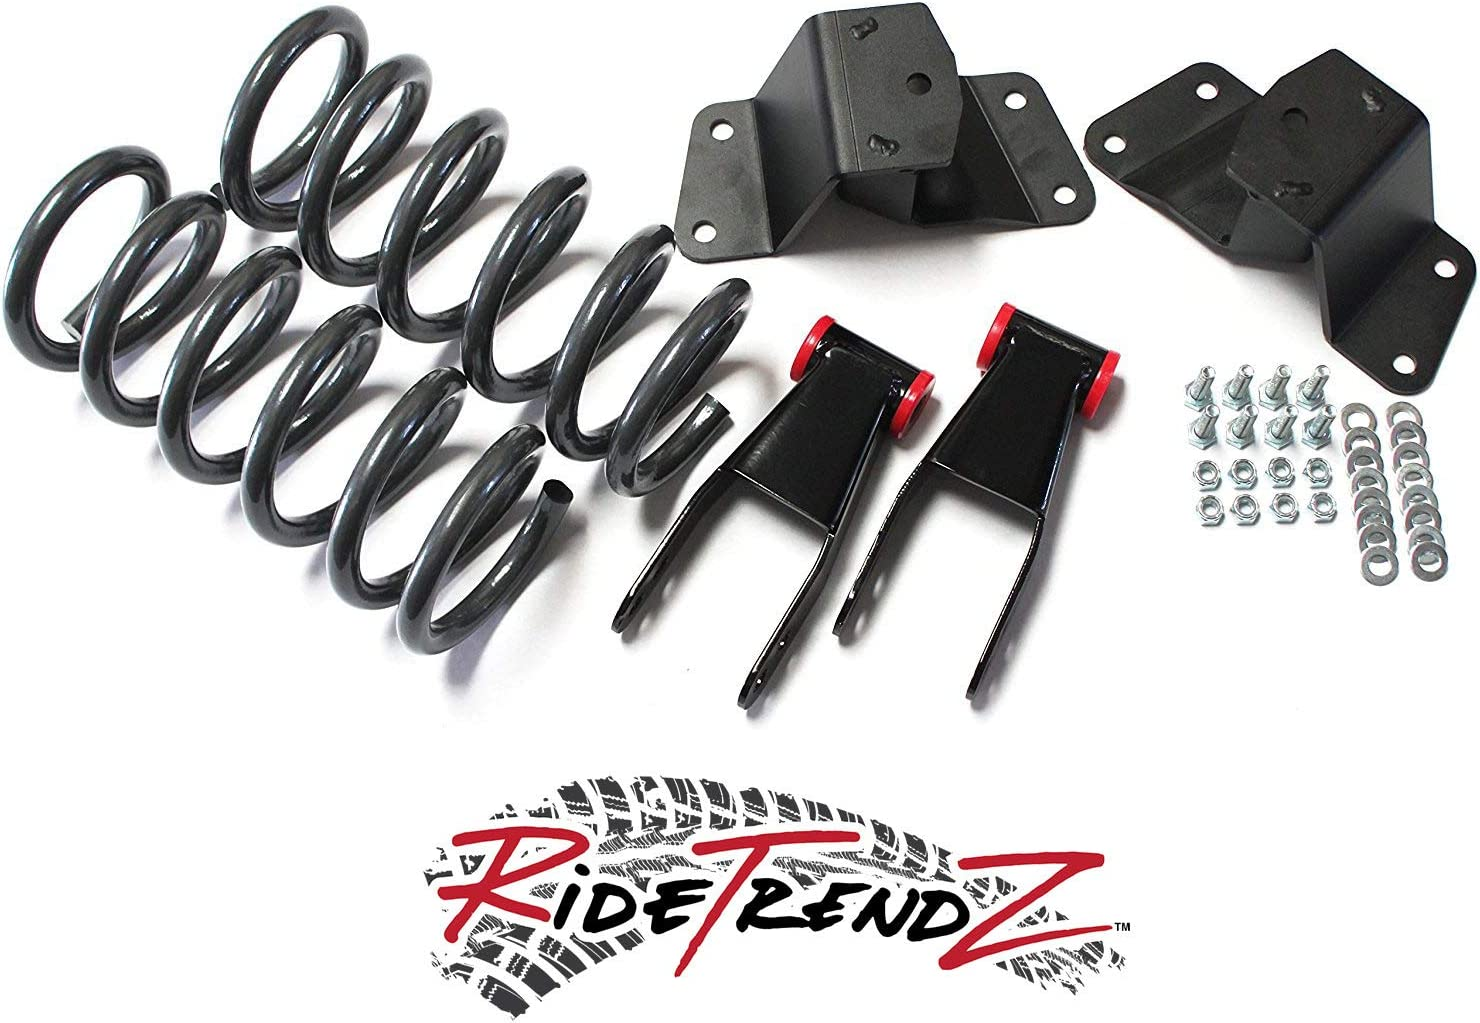 3 Rear Hanger /& Shackle Kit V6 Motor 2WD RTZ Fits Chevrolet GMC Silverado Sierra 1500 Pickup Lowering Kit 2 Front Lowering Drop Coil Springs